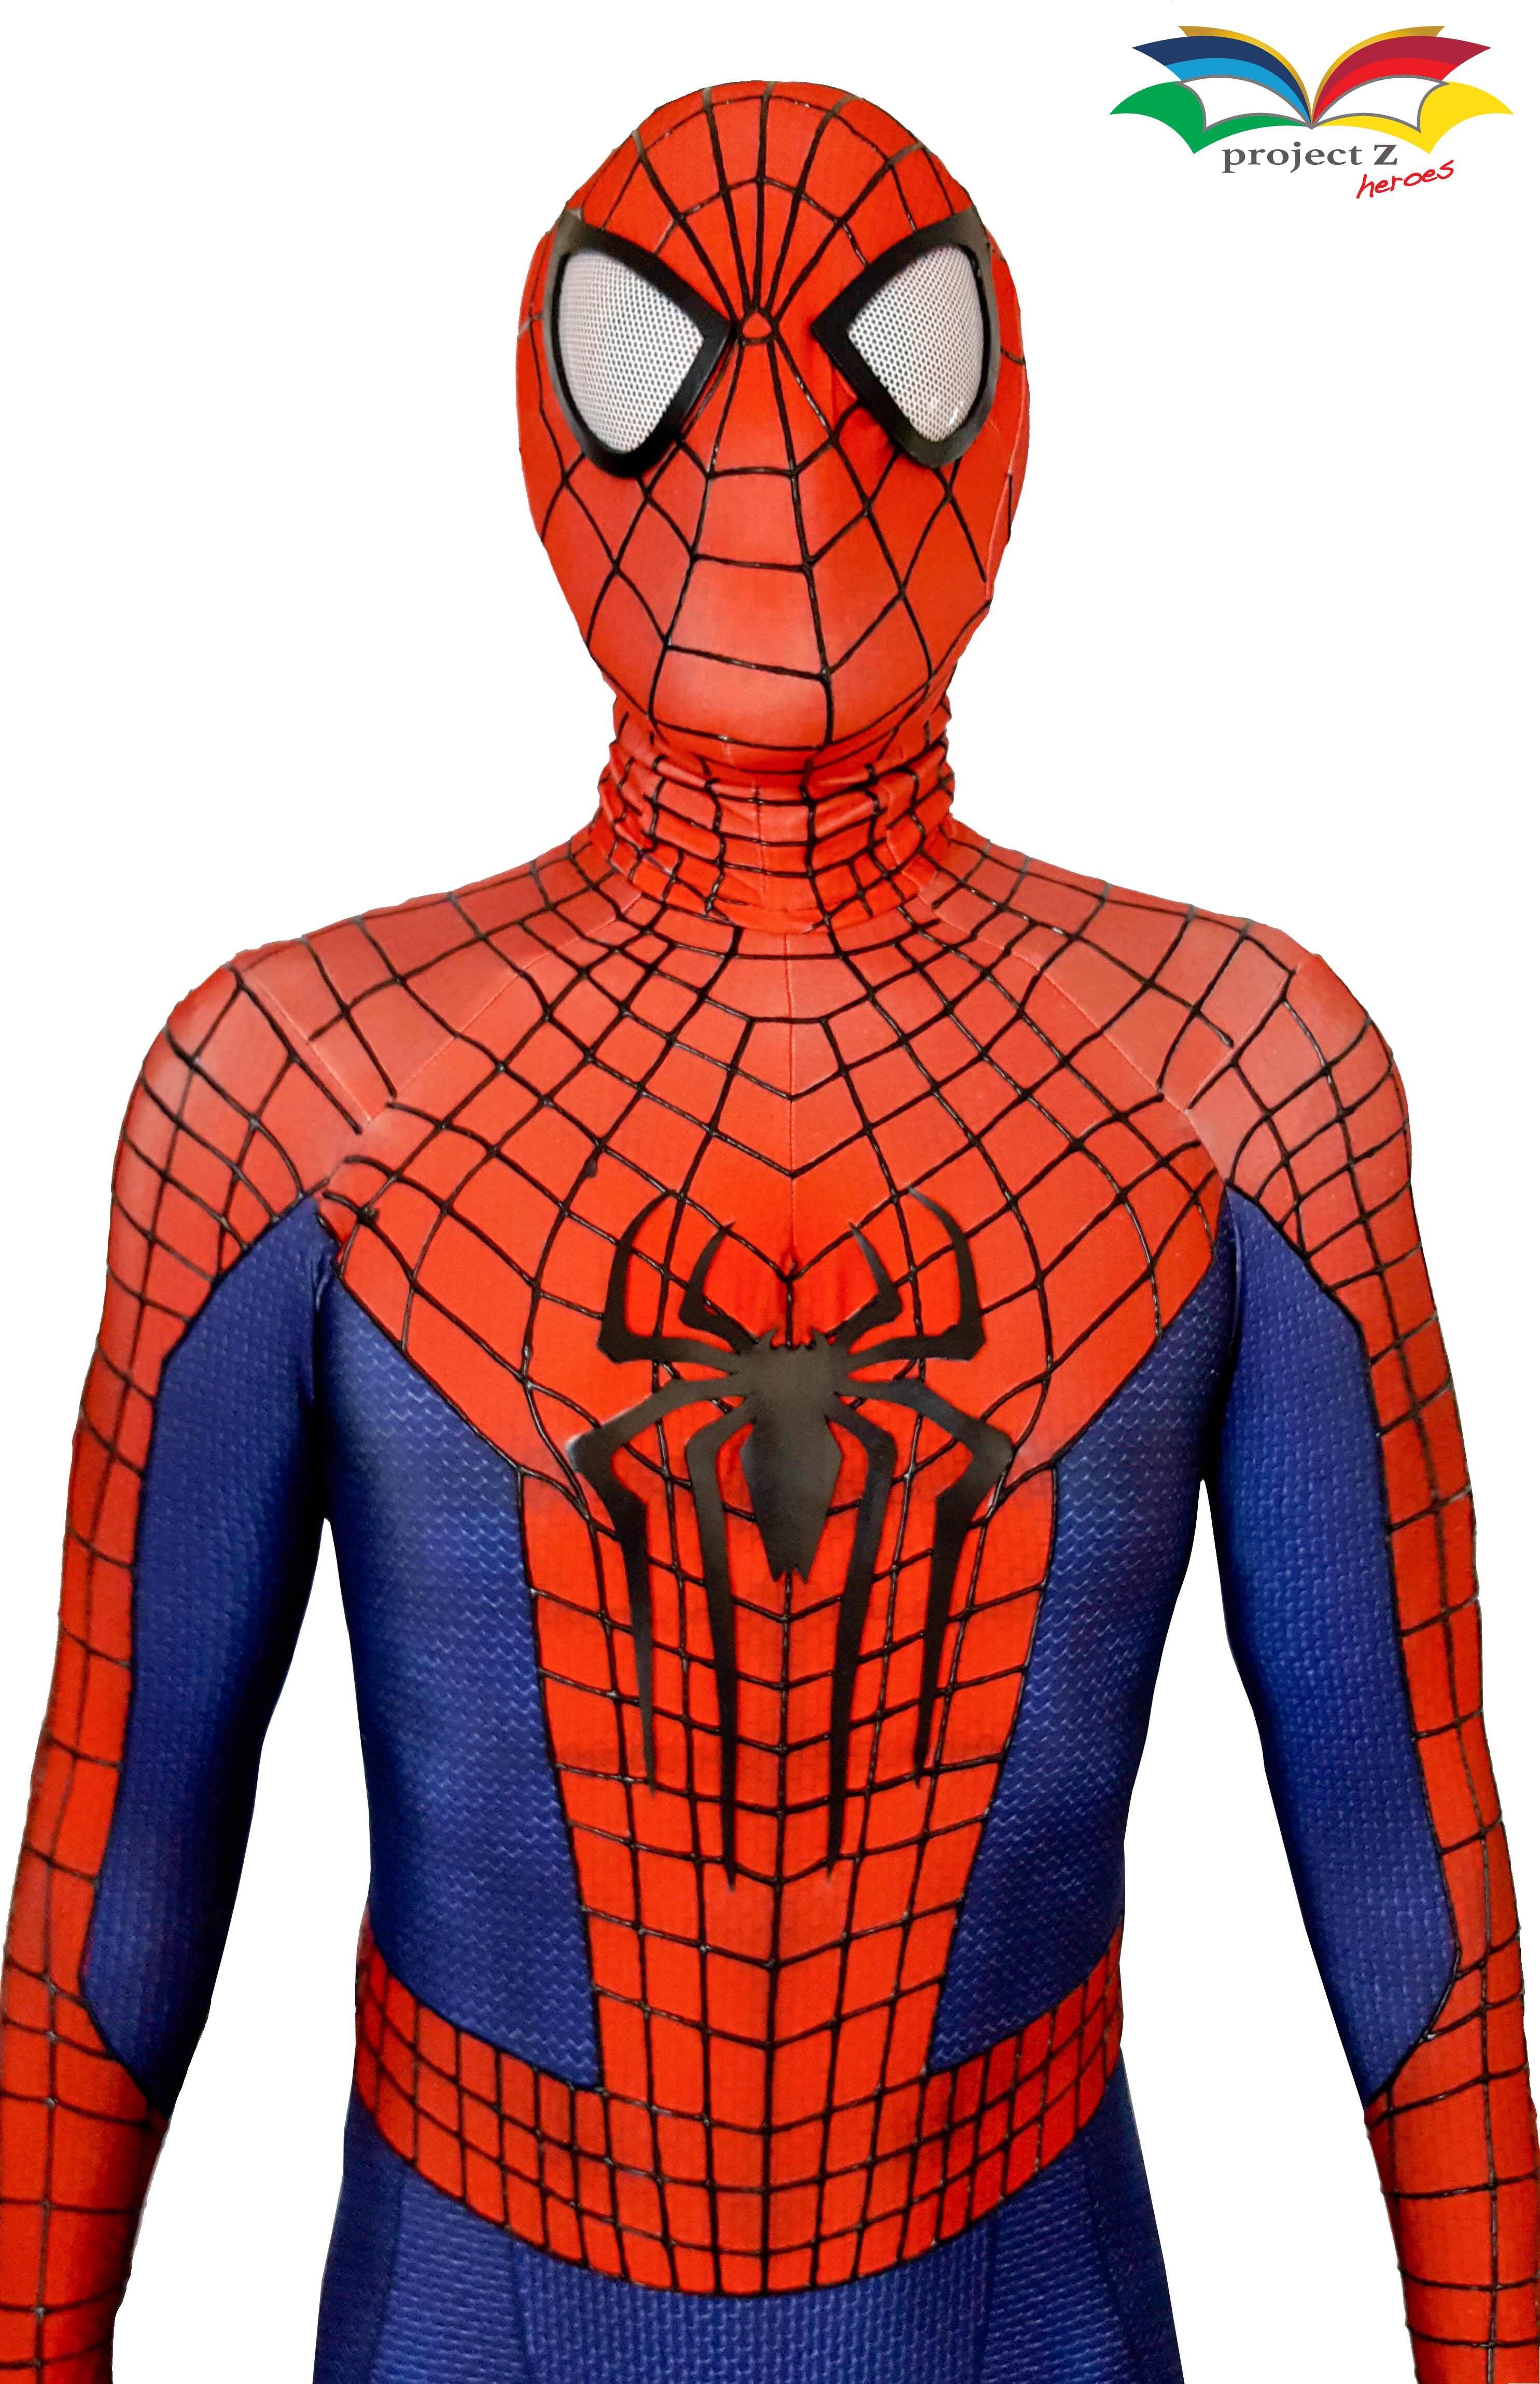 Spiderman costume closeup 1